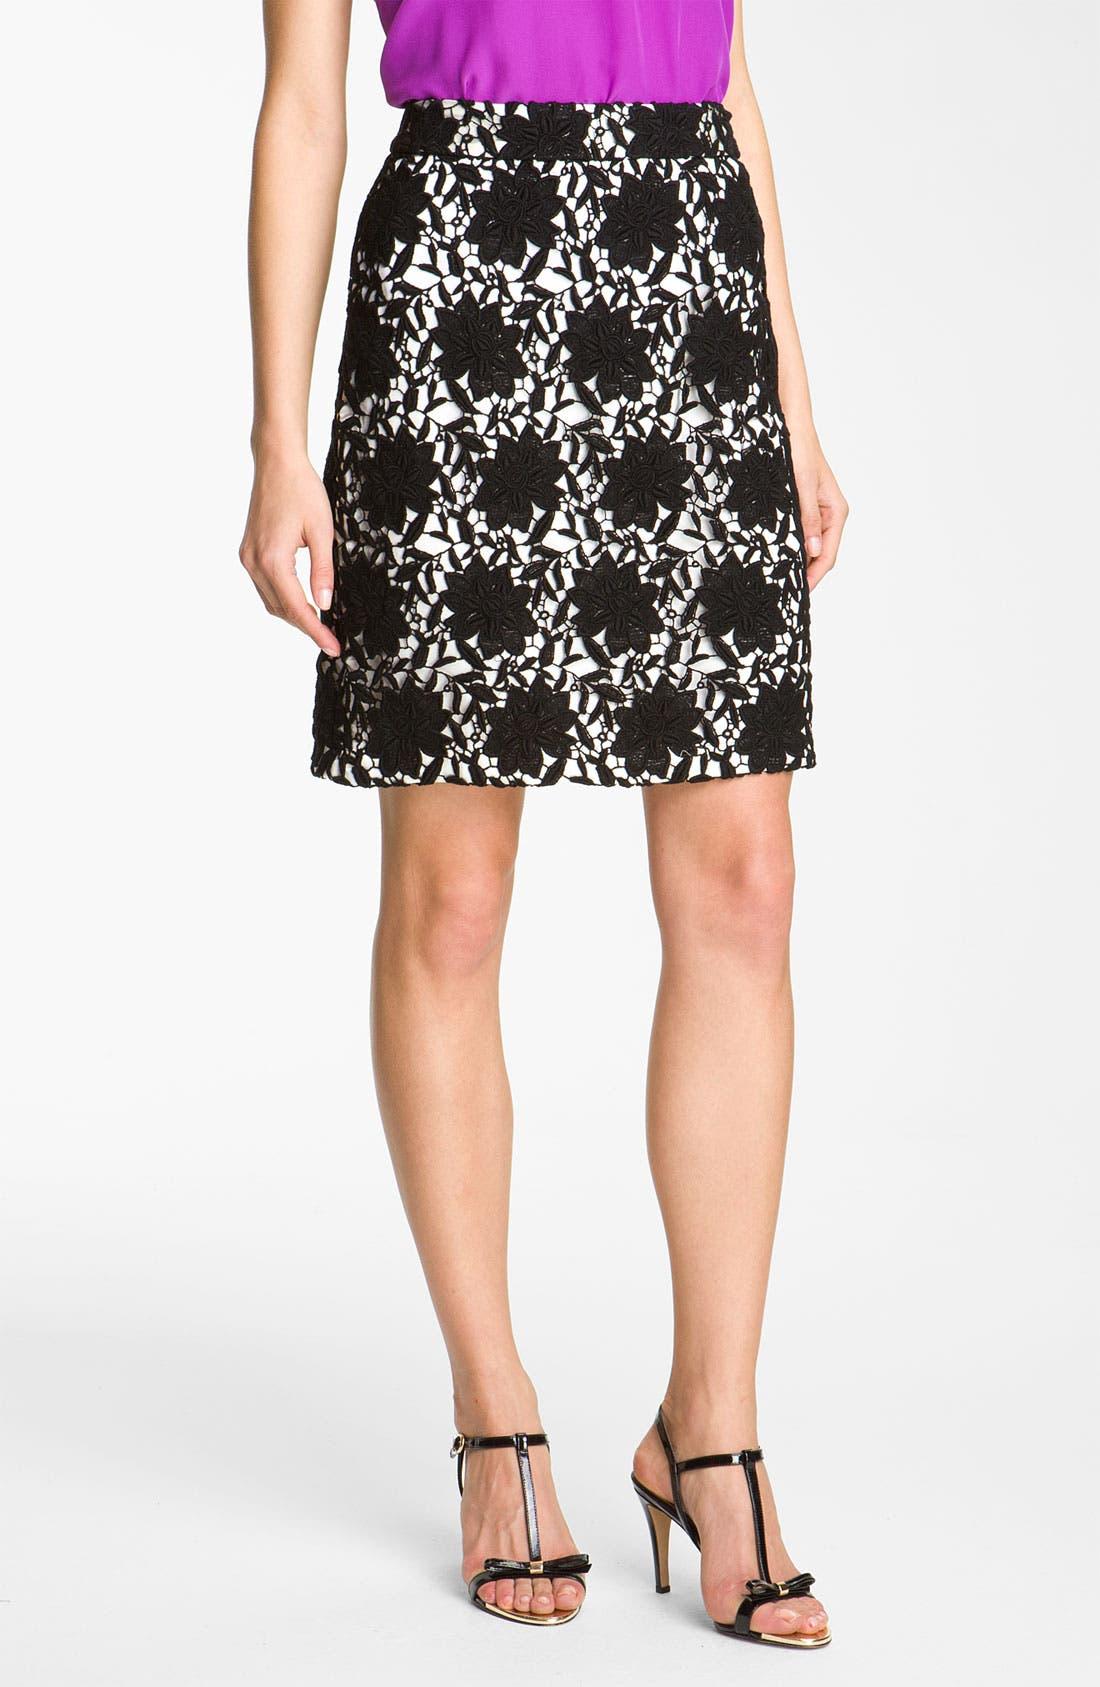 Alternate Image 1 Selected - kate spade new york 'judy' skirt